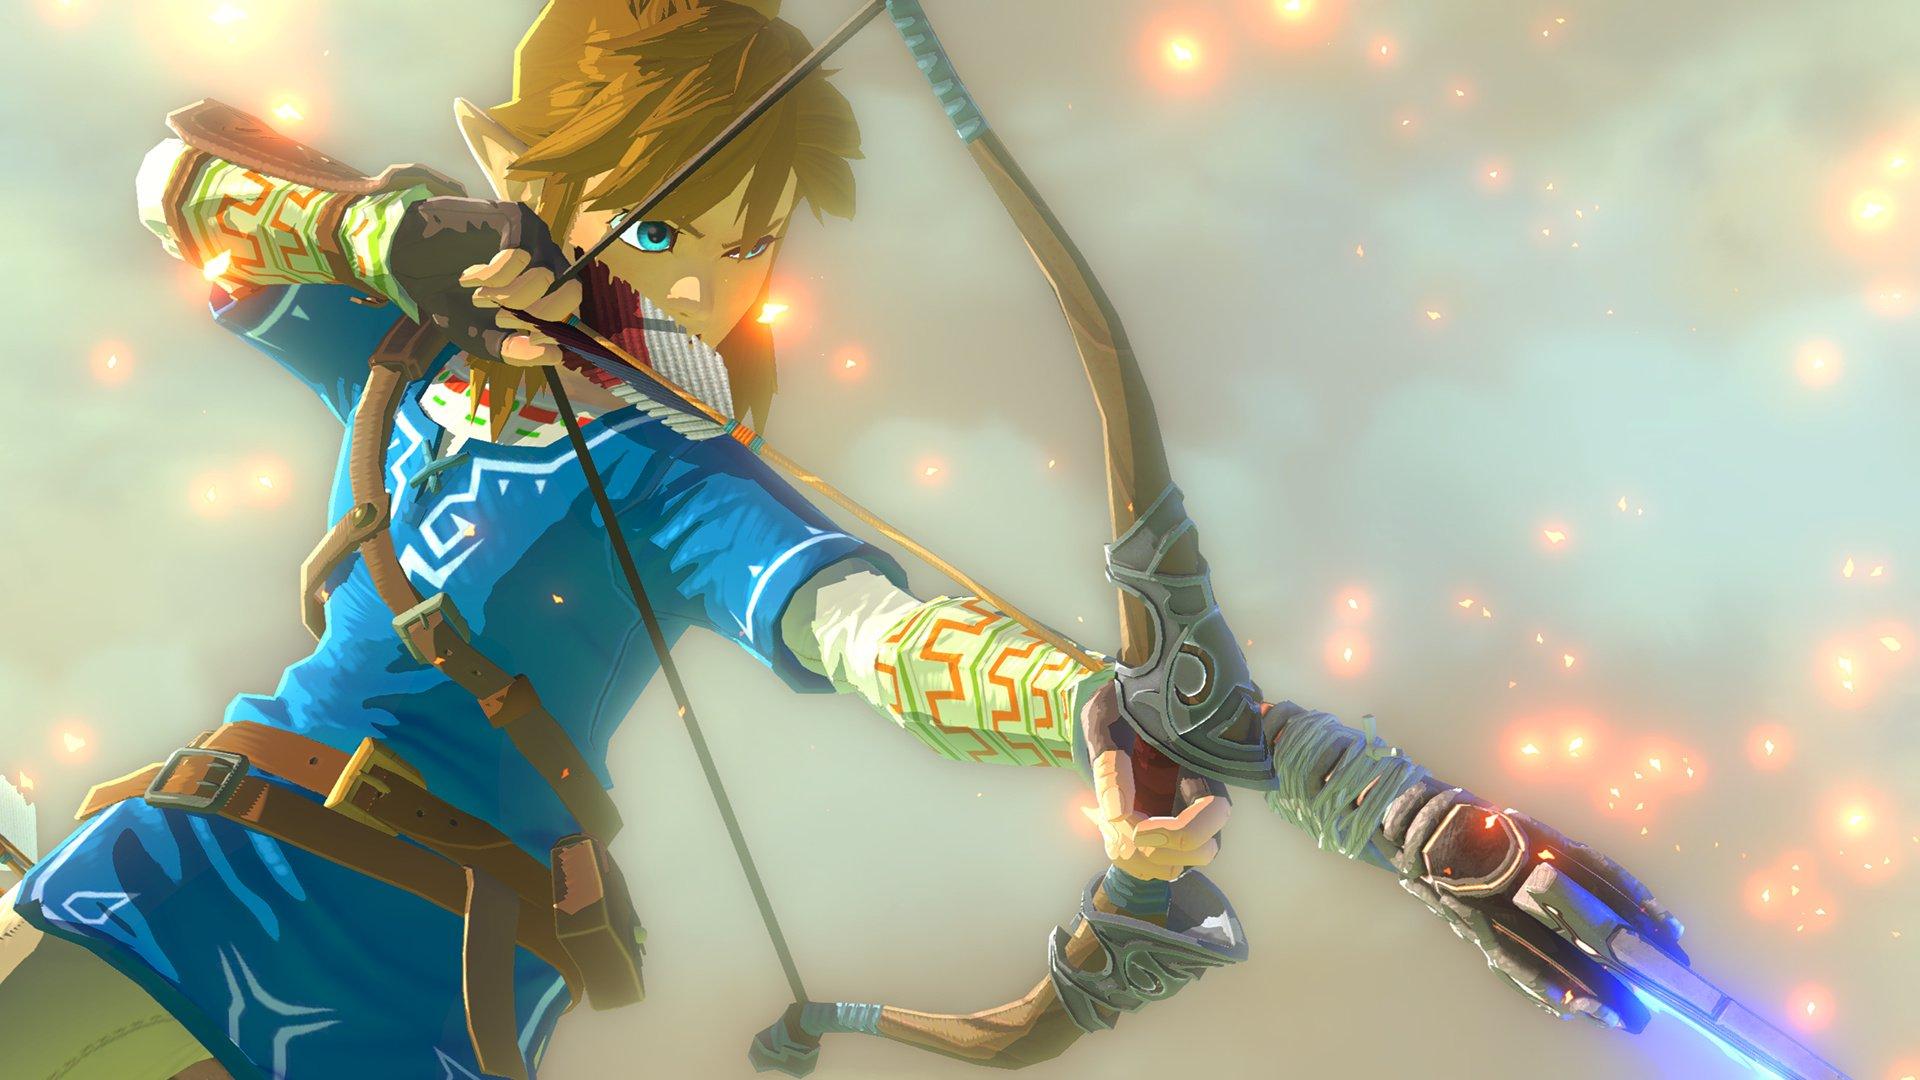 Zelda Breath Of The Wild Wallpaper Hd: The Legend Of Zelda: Breath Of The Wild Full HD Wallpaper